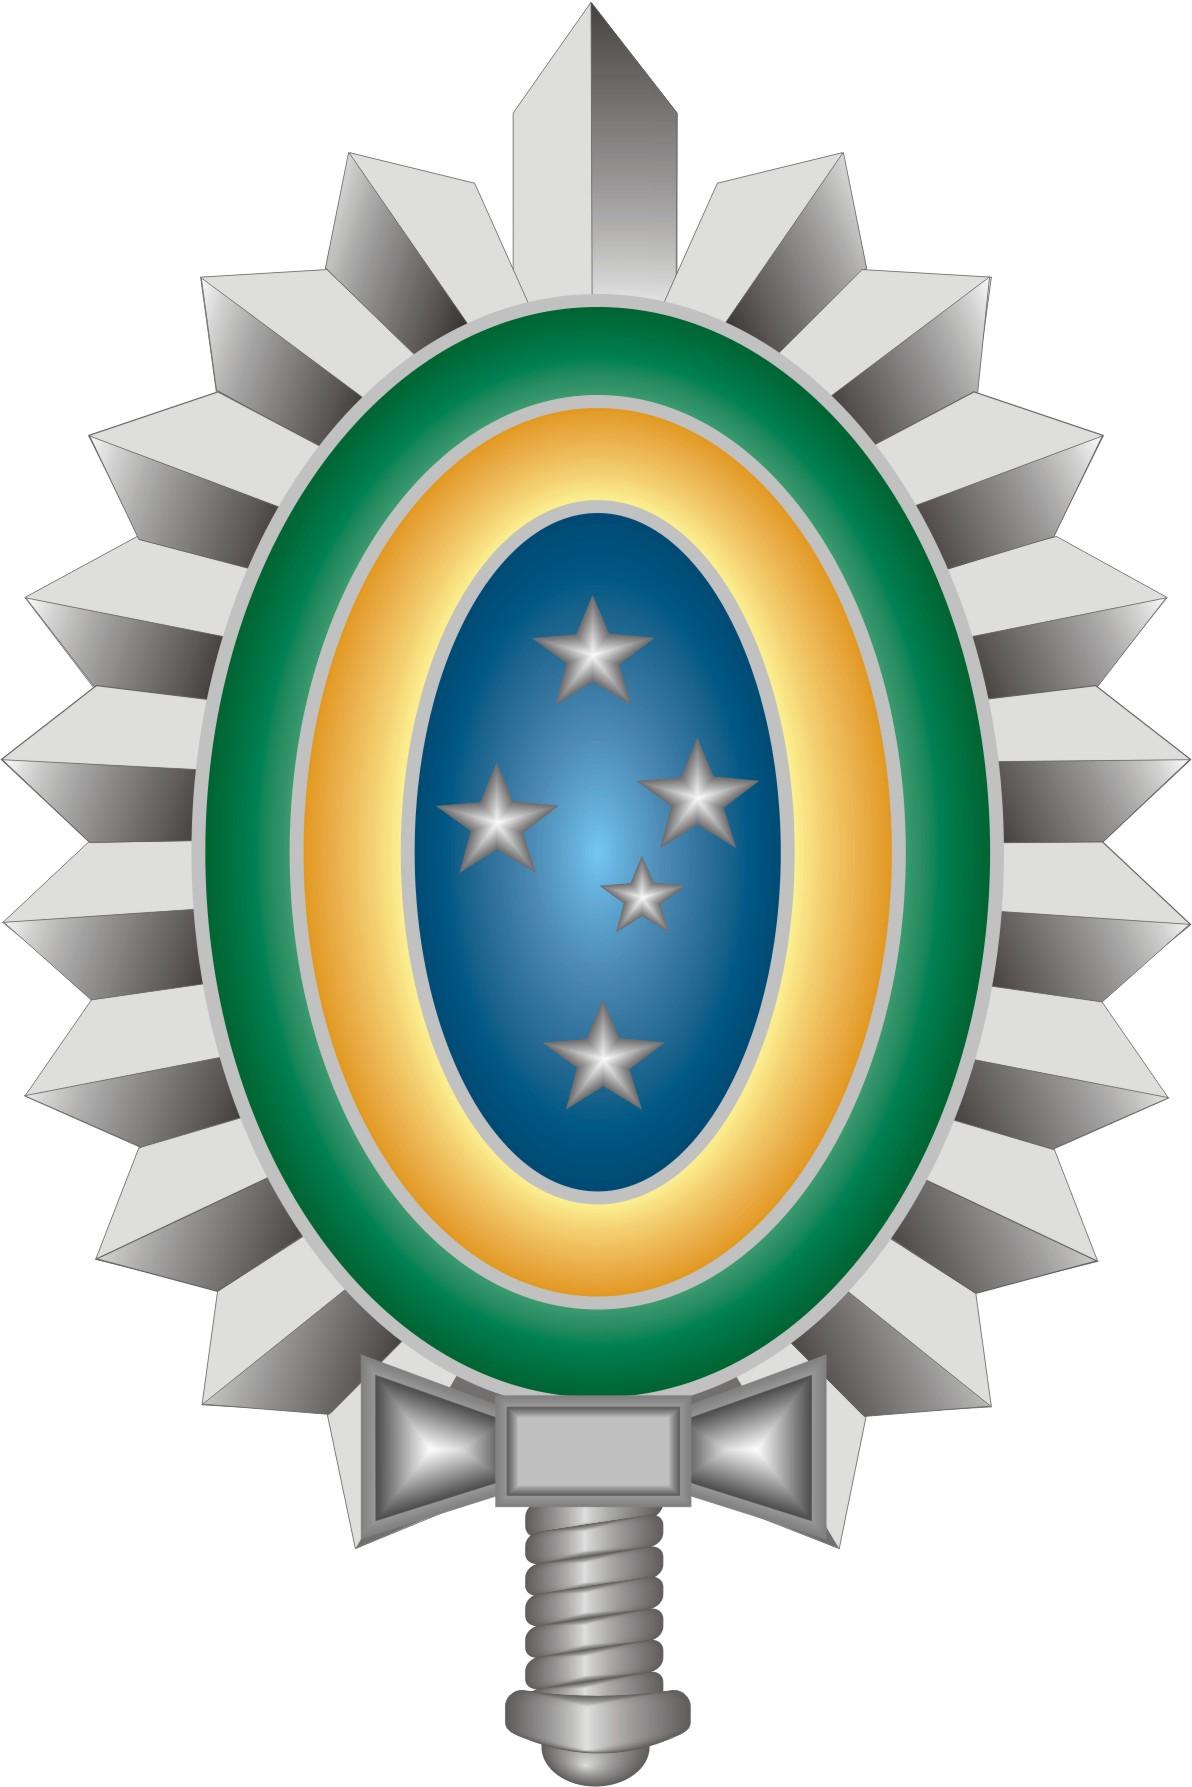 Brazilian army logo.jpg